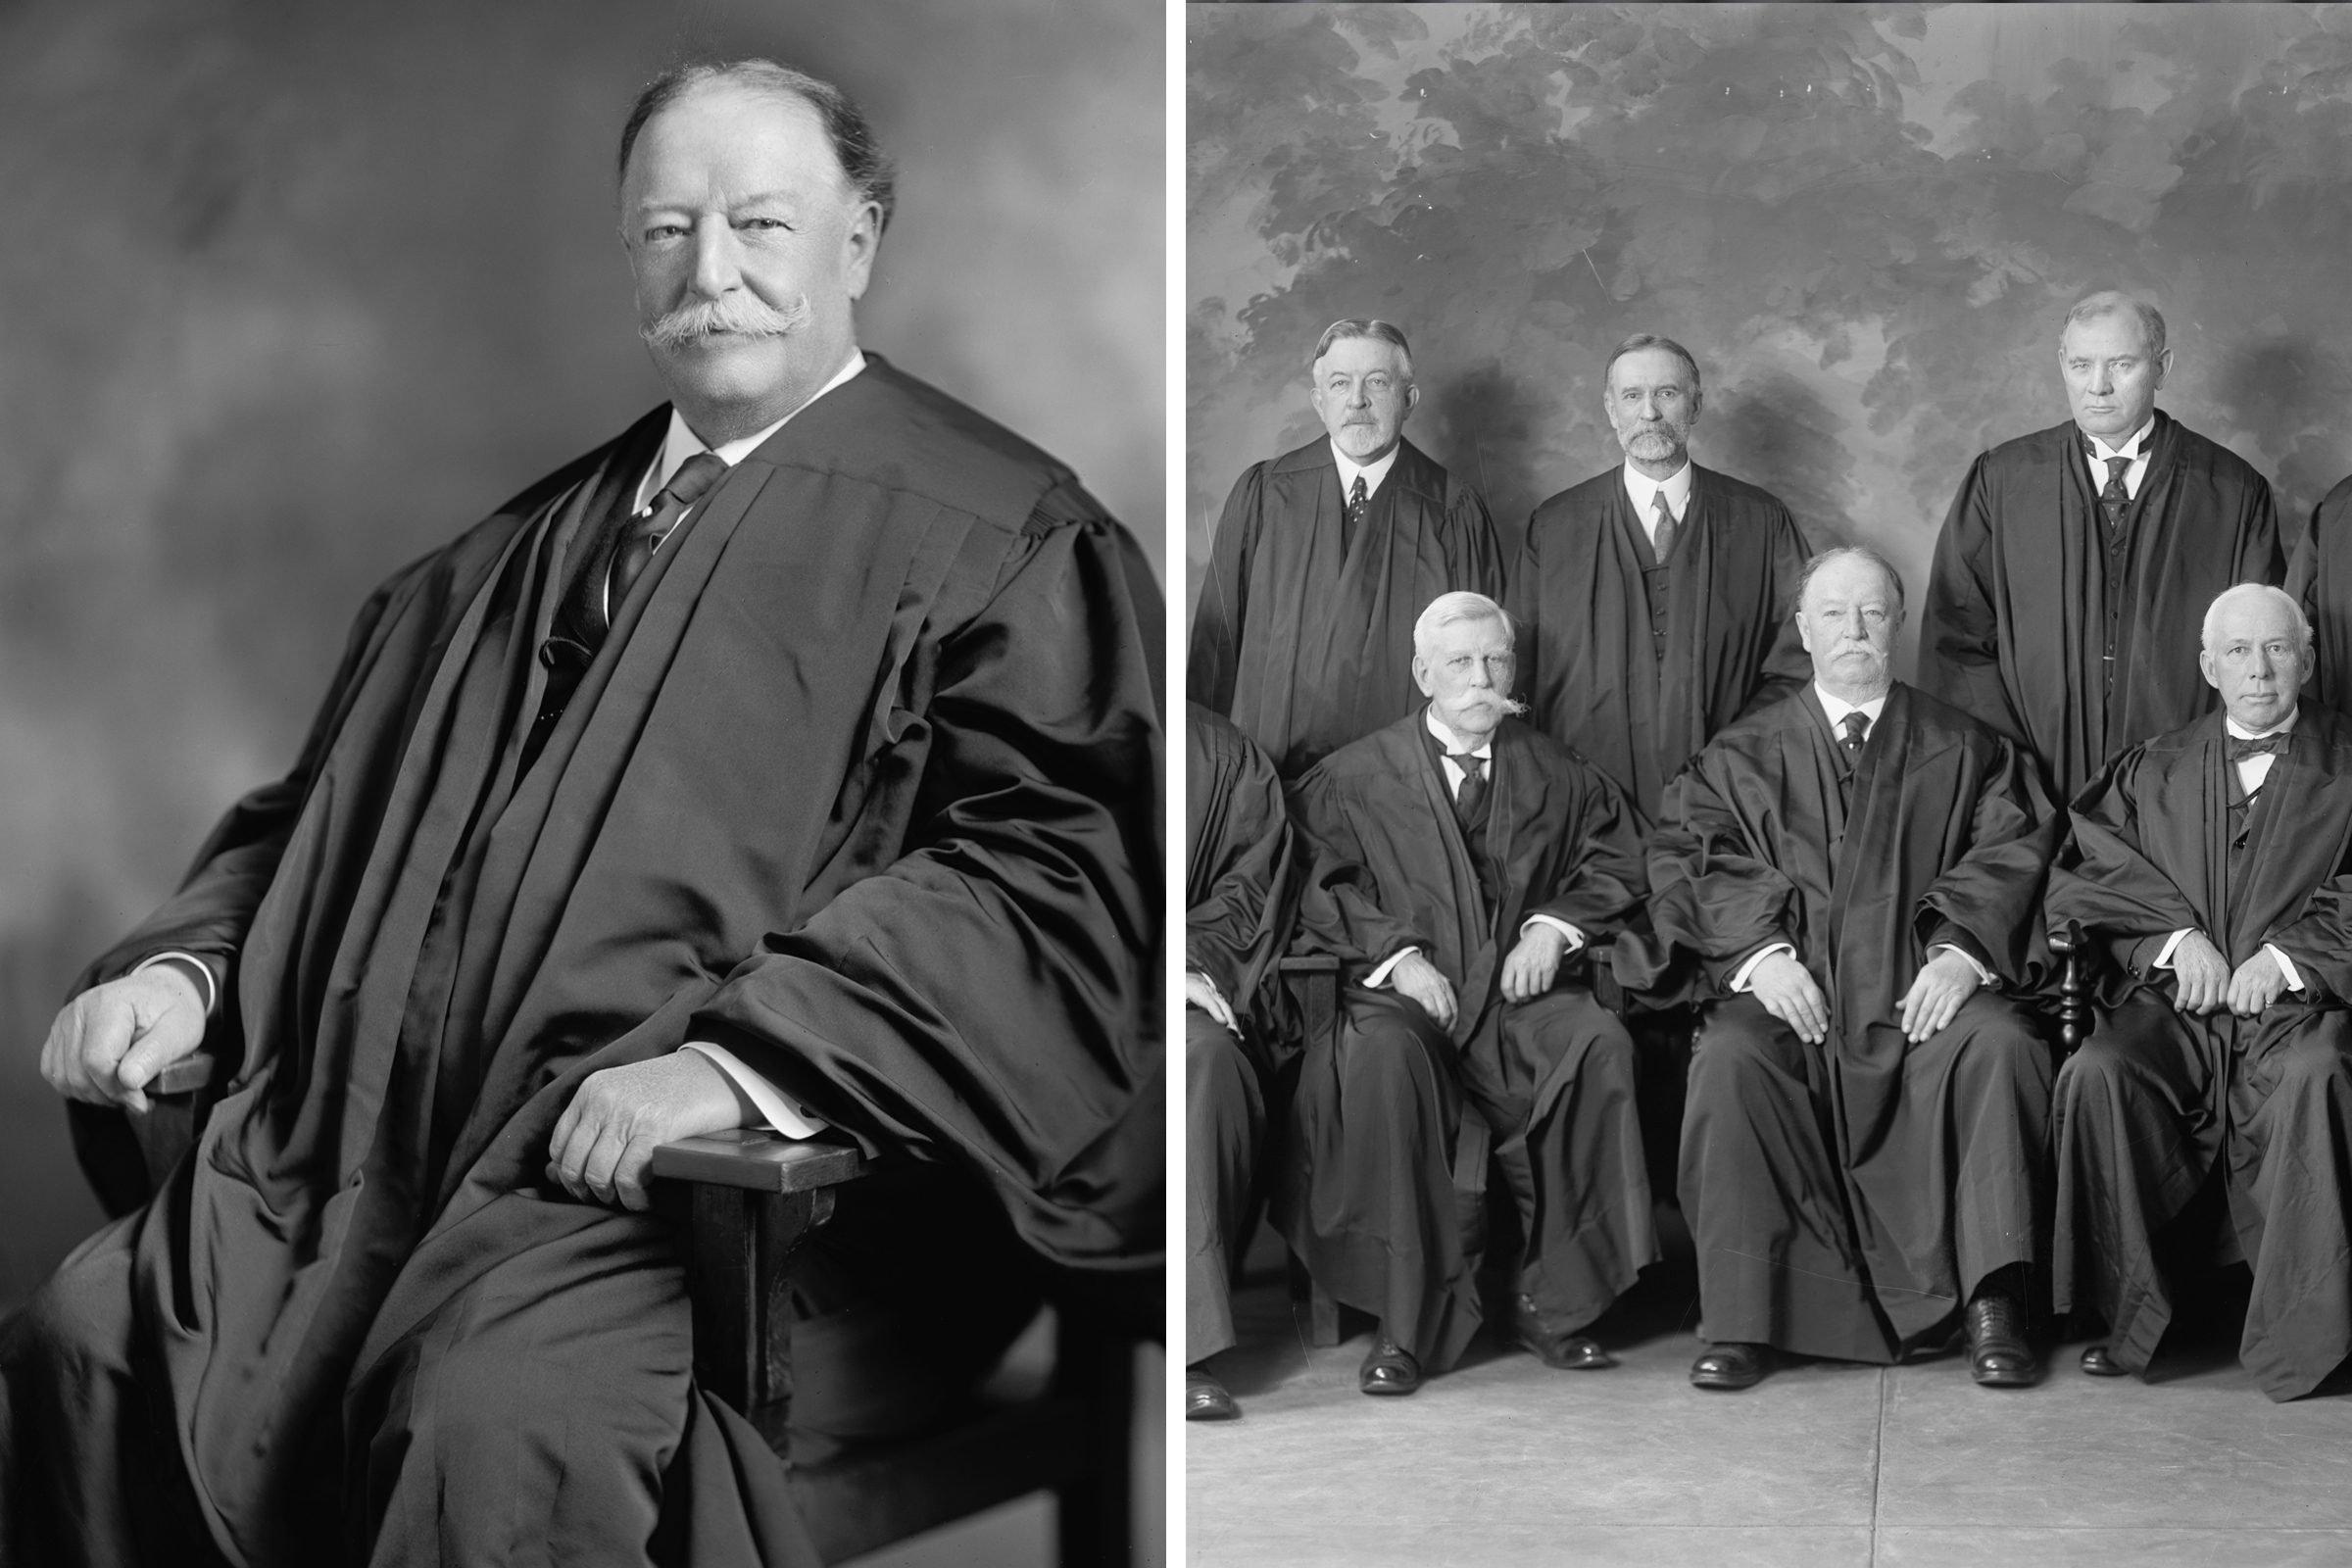 William Howard Taft: Supreme Court justice